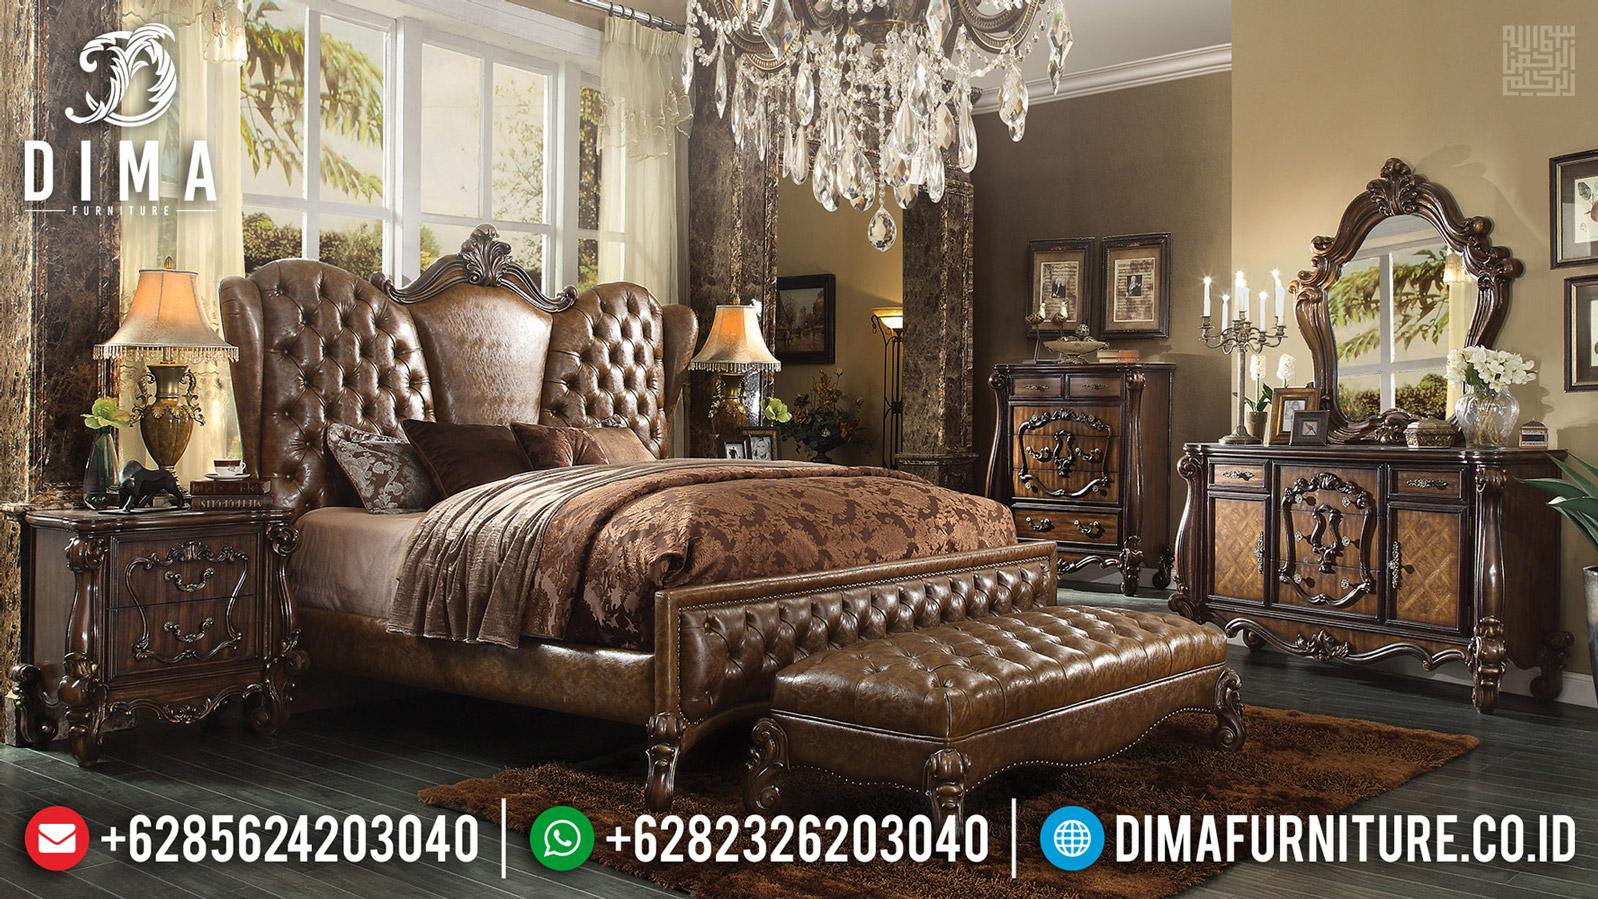 Desain Kamar Set Mewah Jati Queen Size Natural Kombinasi BT-0522